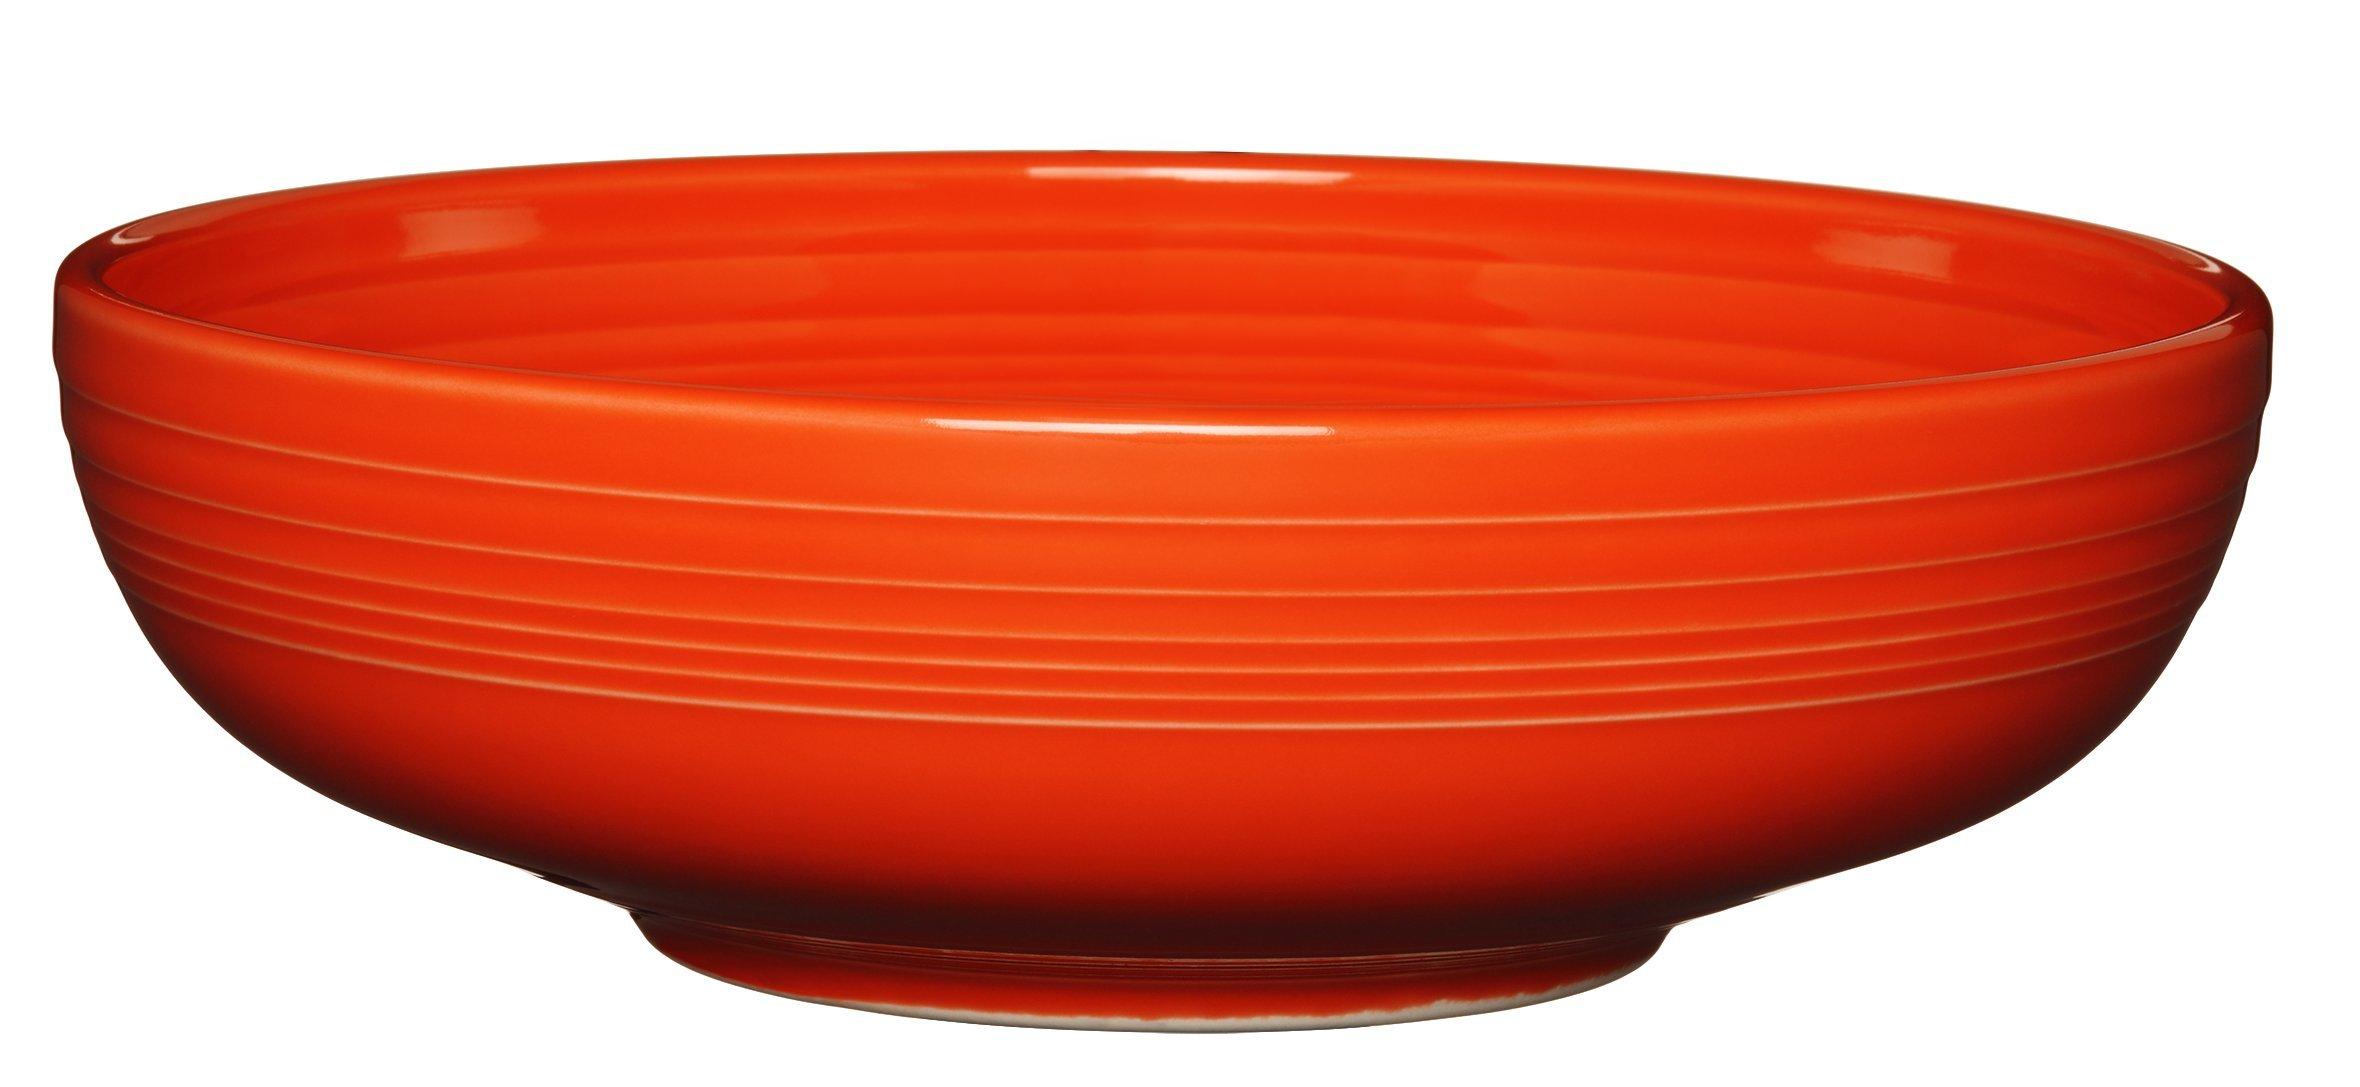 Fiesta Bistro Serving Bowl, 96 oz, Poppy